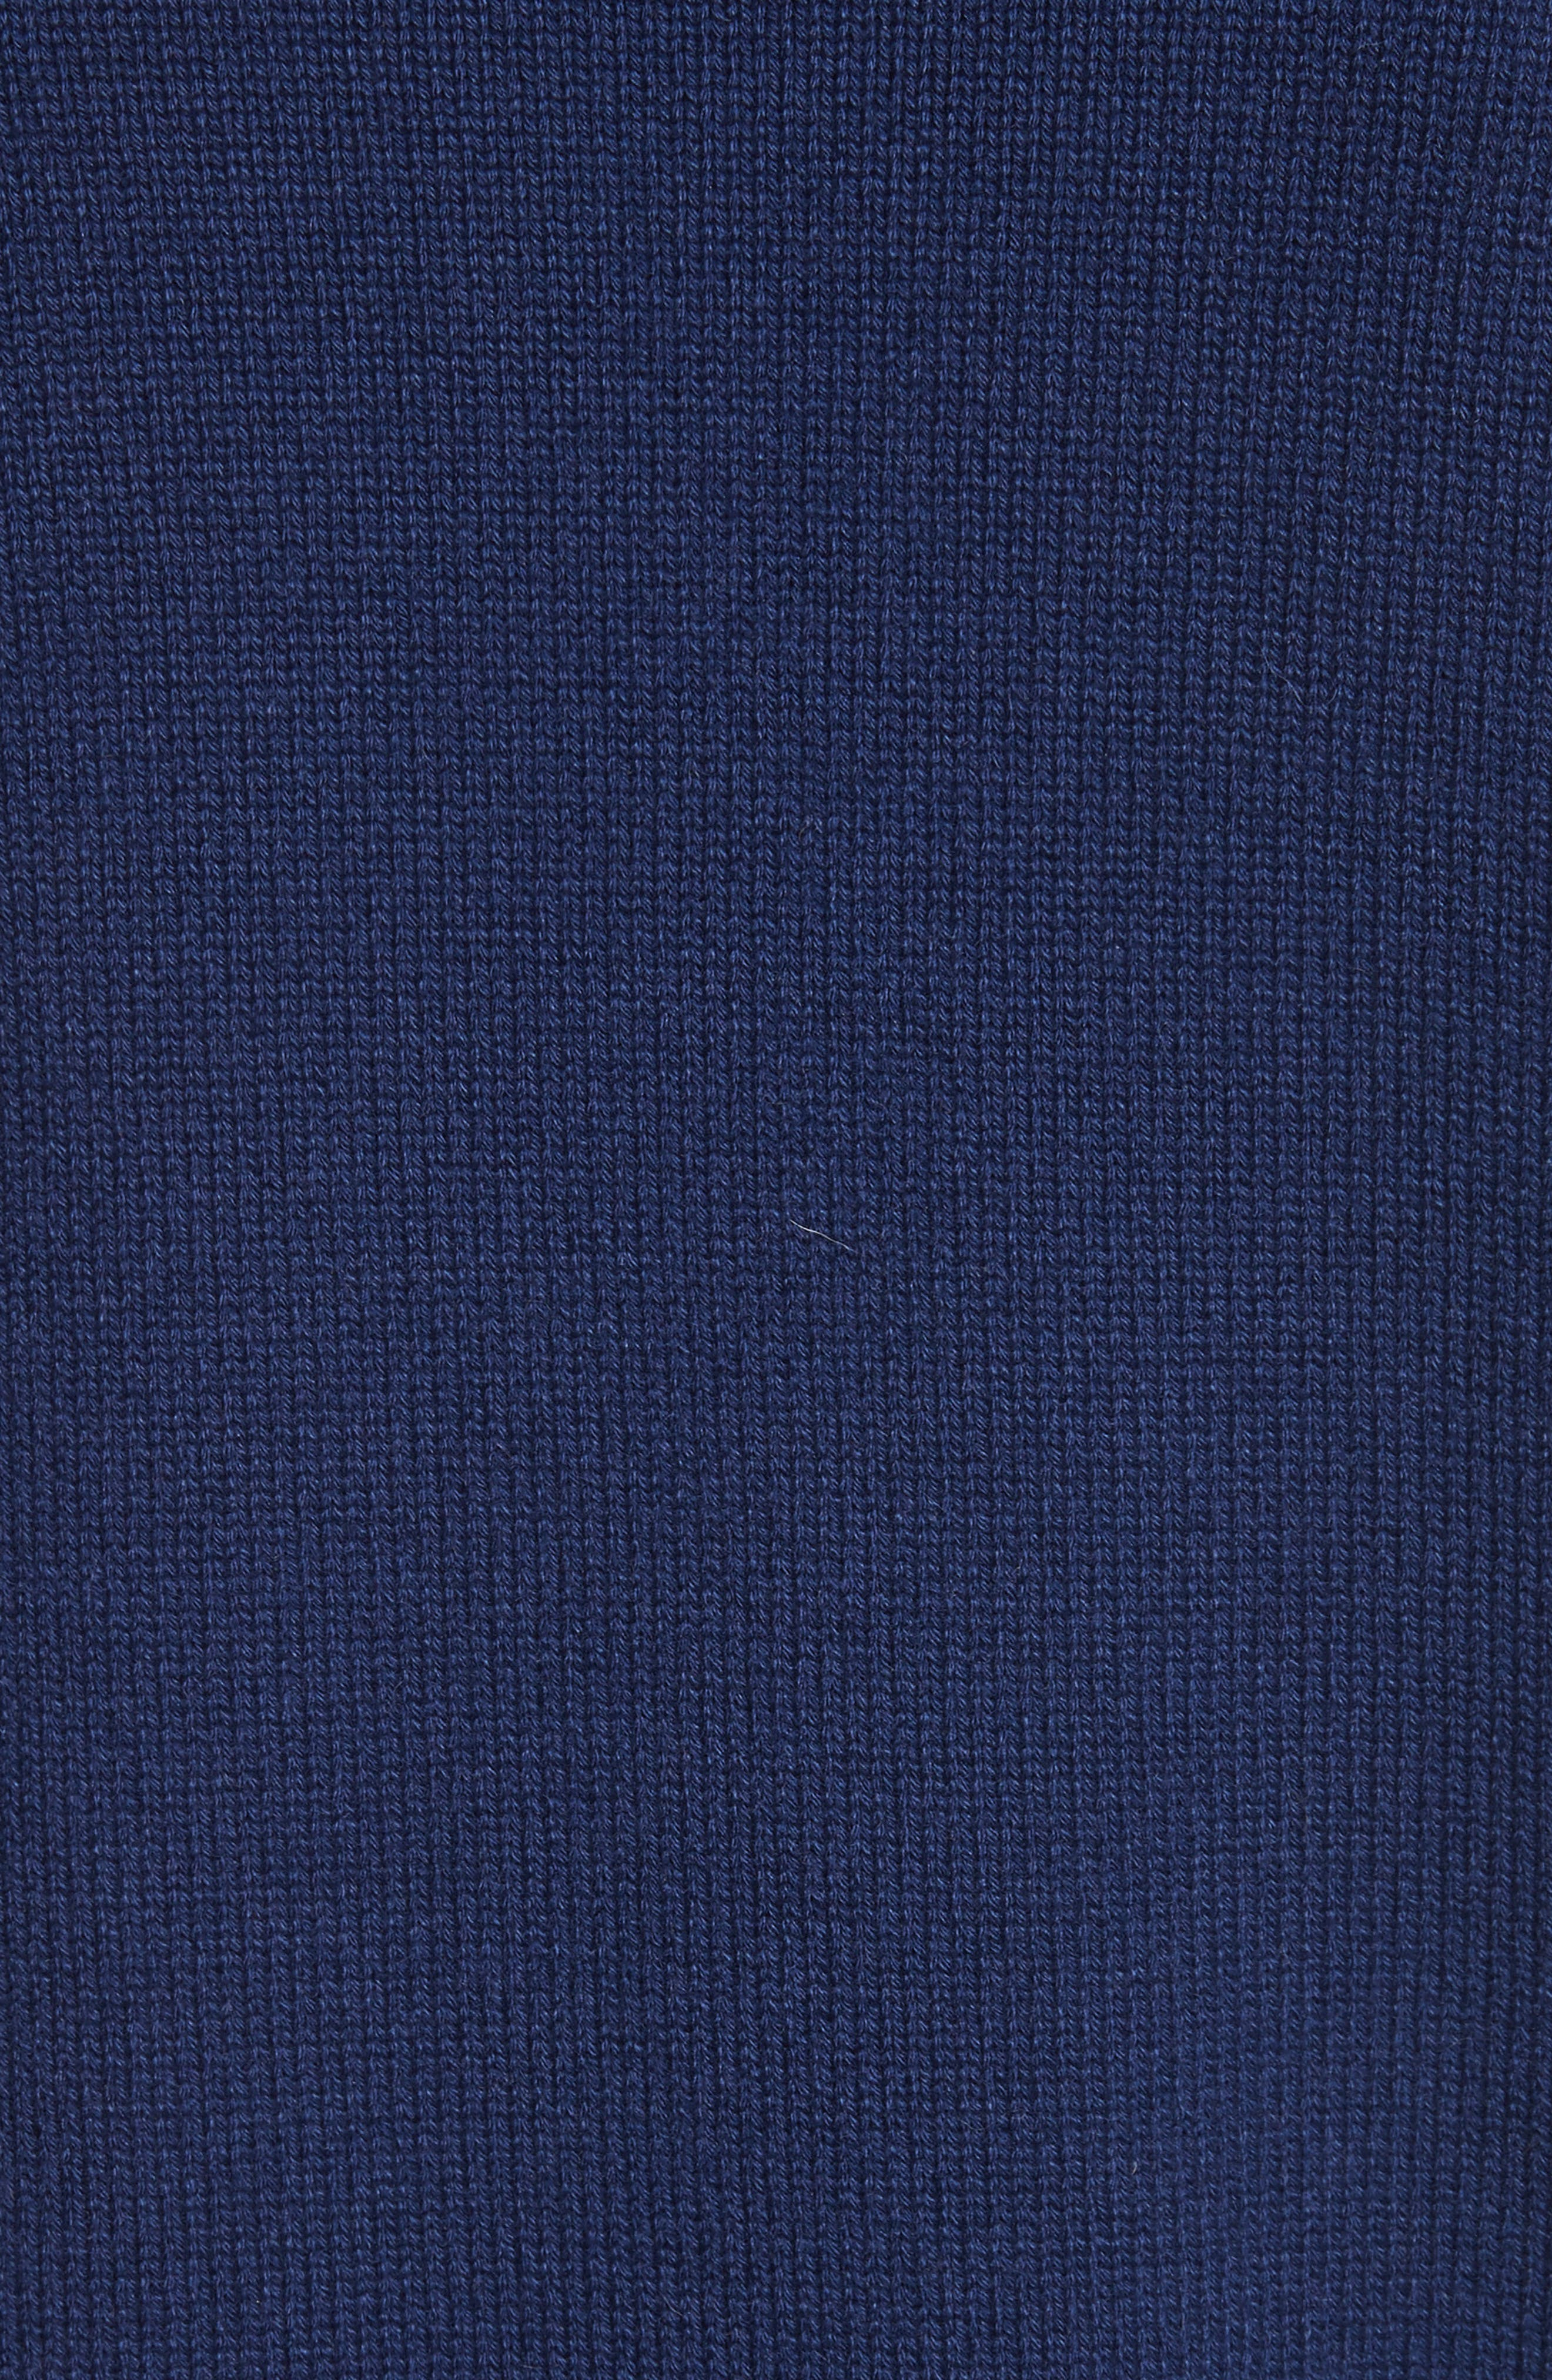 Asymmetrical Cashmere Pullover,                             Alternate thumbnail 5, color,                             489